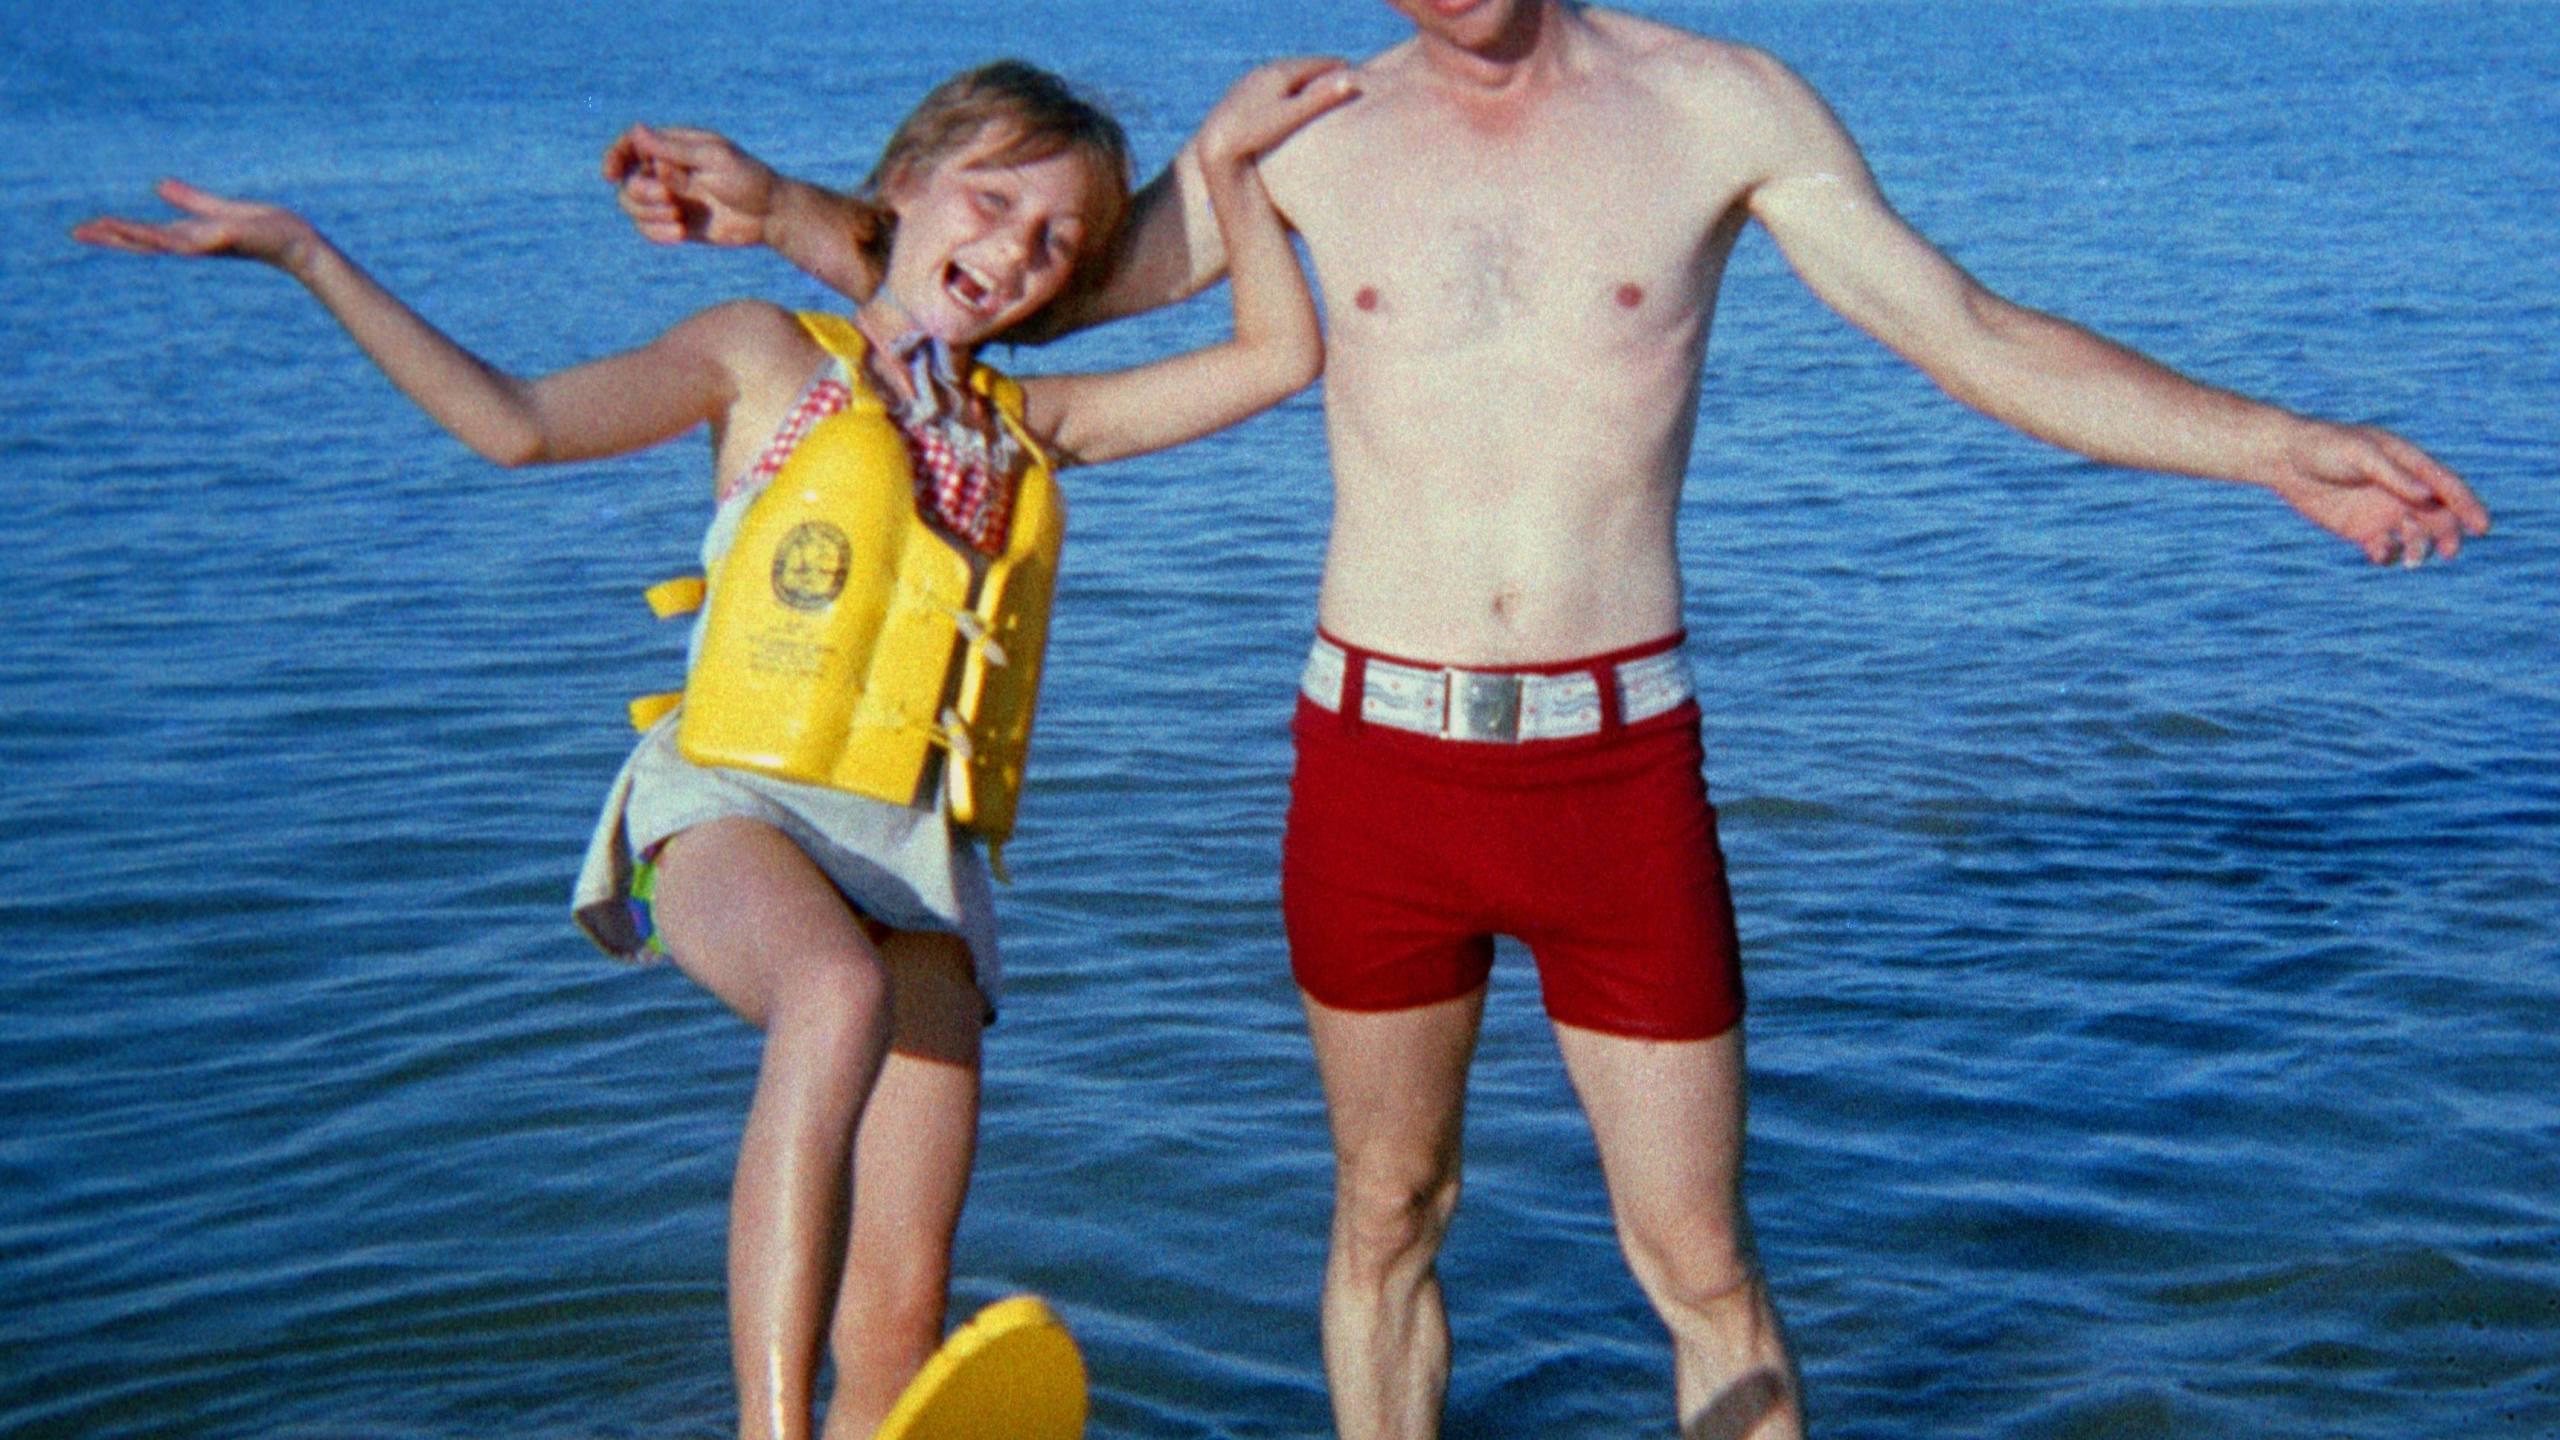 JAN AND BERCHTOLD AT BEACH_1556568388917.jpg.jpg